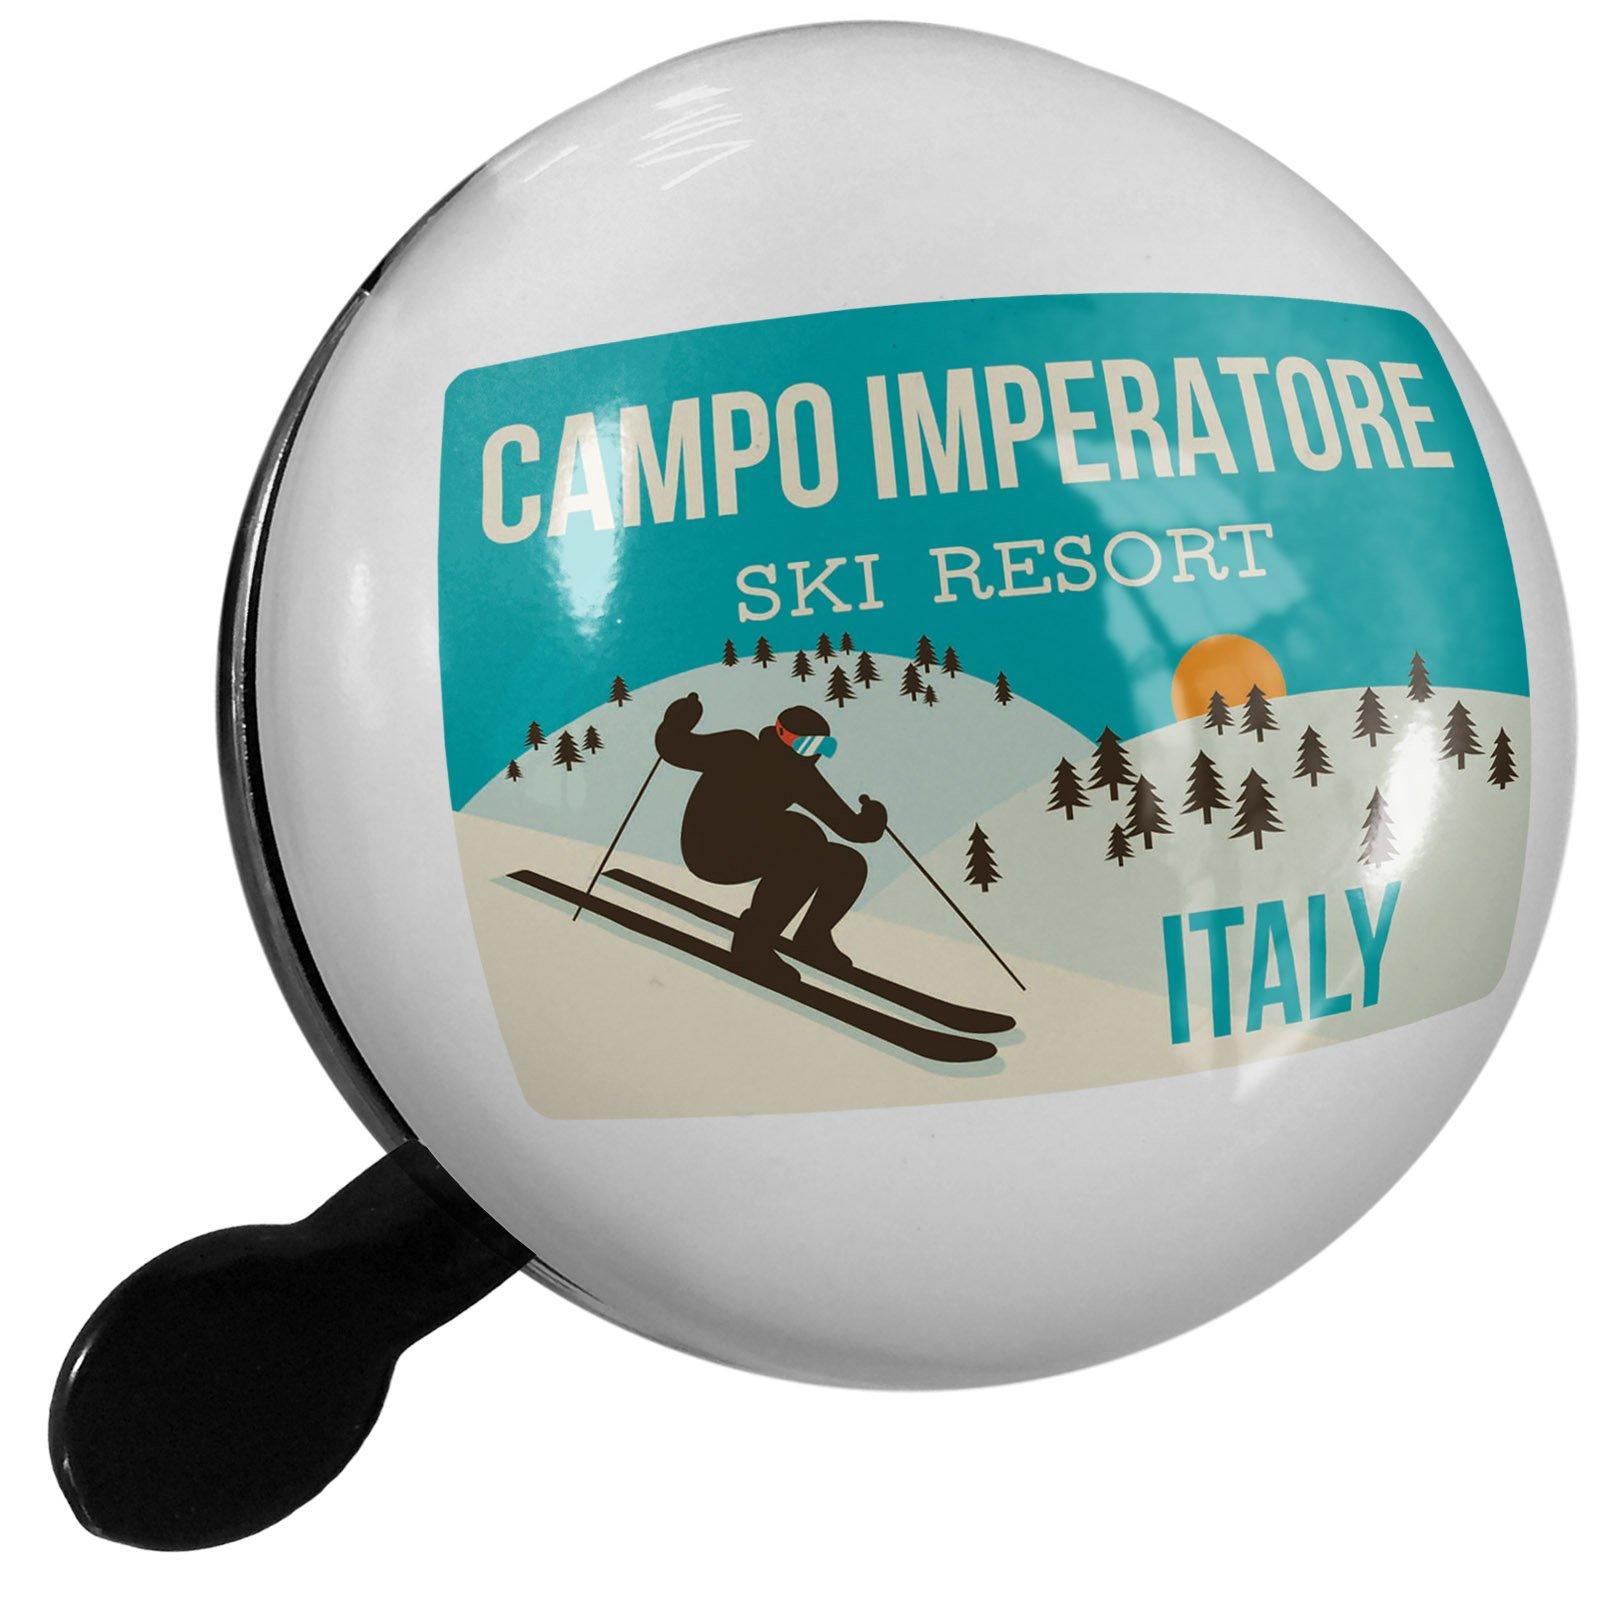 Small Bike Bell Campo Imperatore Ski Resort - Italy Ski Resort - NEONBLOND